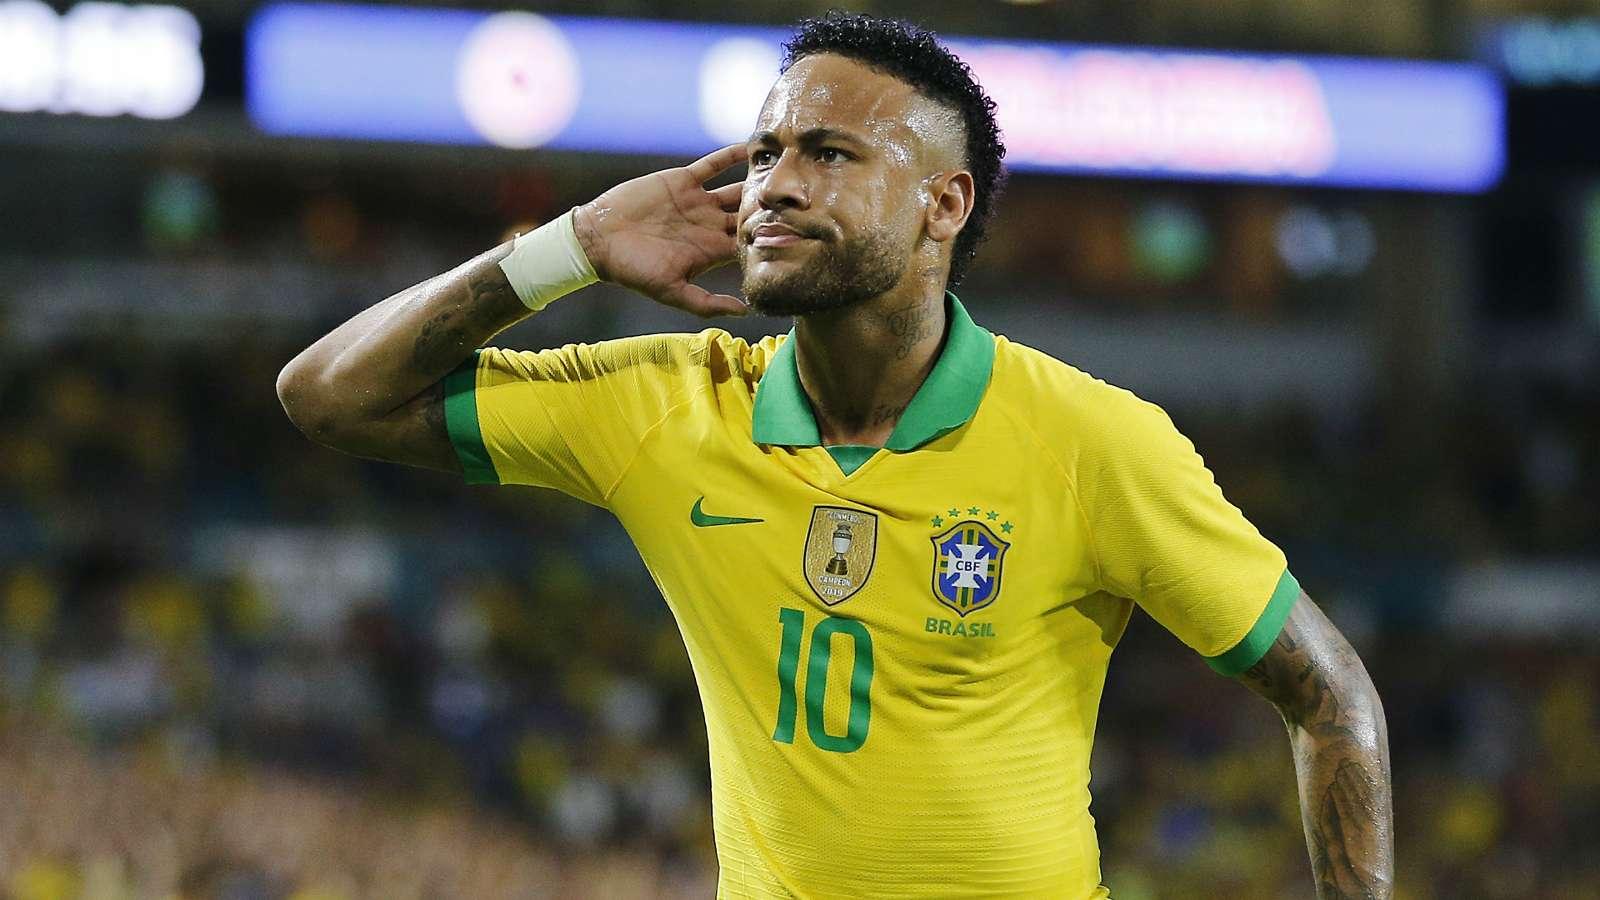 Brazil-International Friendlies-PSG-Ligue 1-پاری سن ژرمن-لیگ یک-برزیل-سلسائو-بازی دوستانه ملی